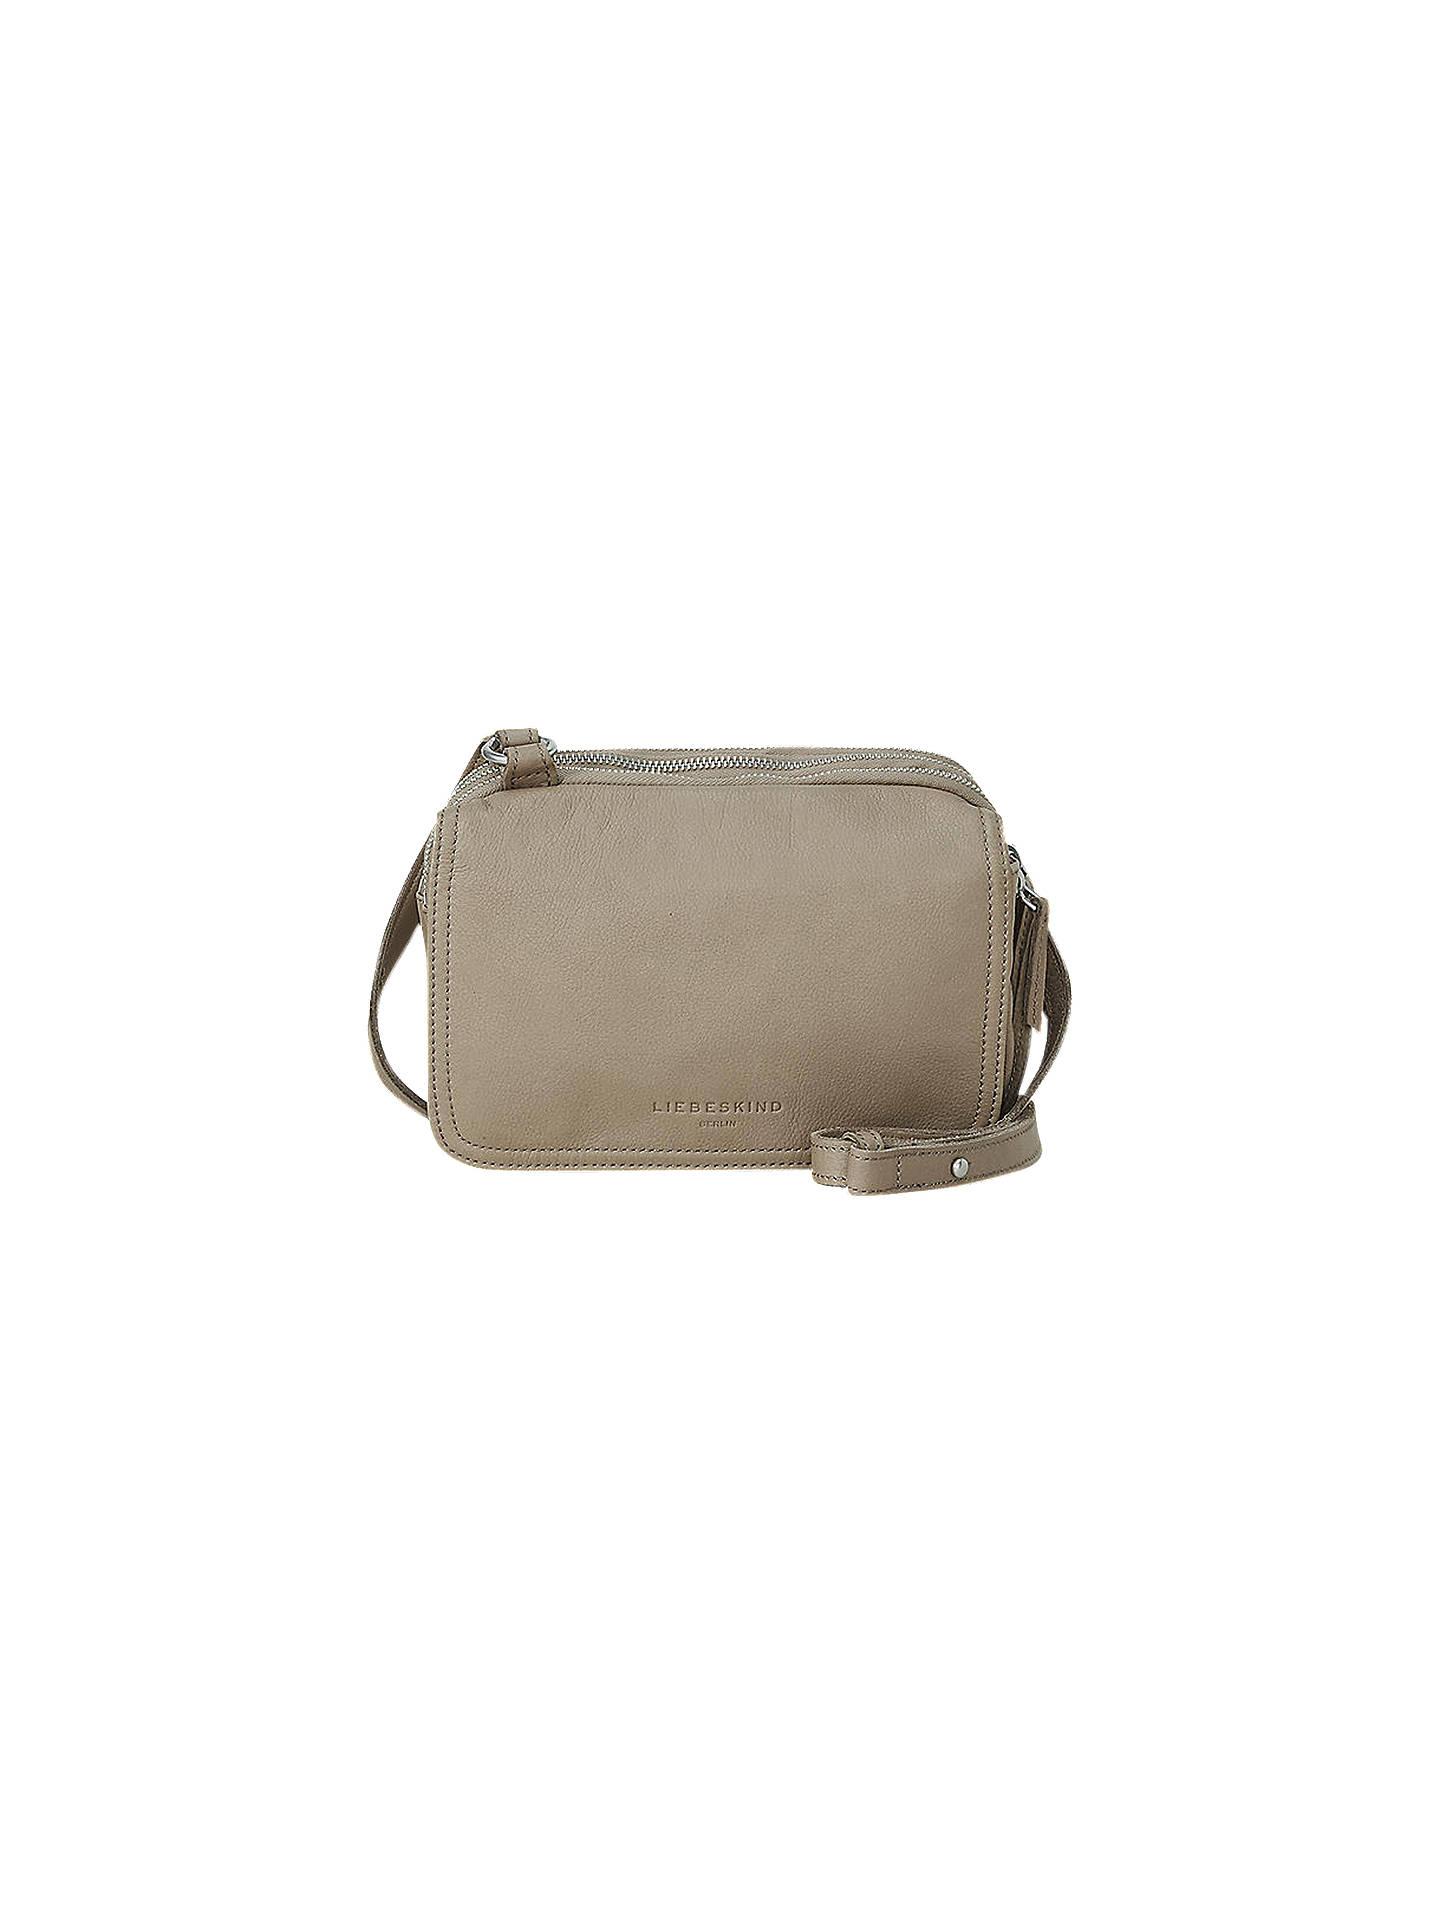 e6cddb5506c7 BuyLiebeskind Berlin Maike 7 Leather Cross Body Bag